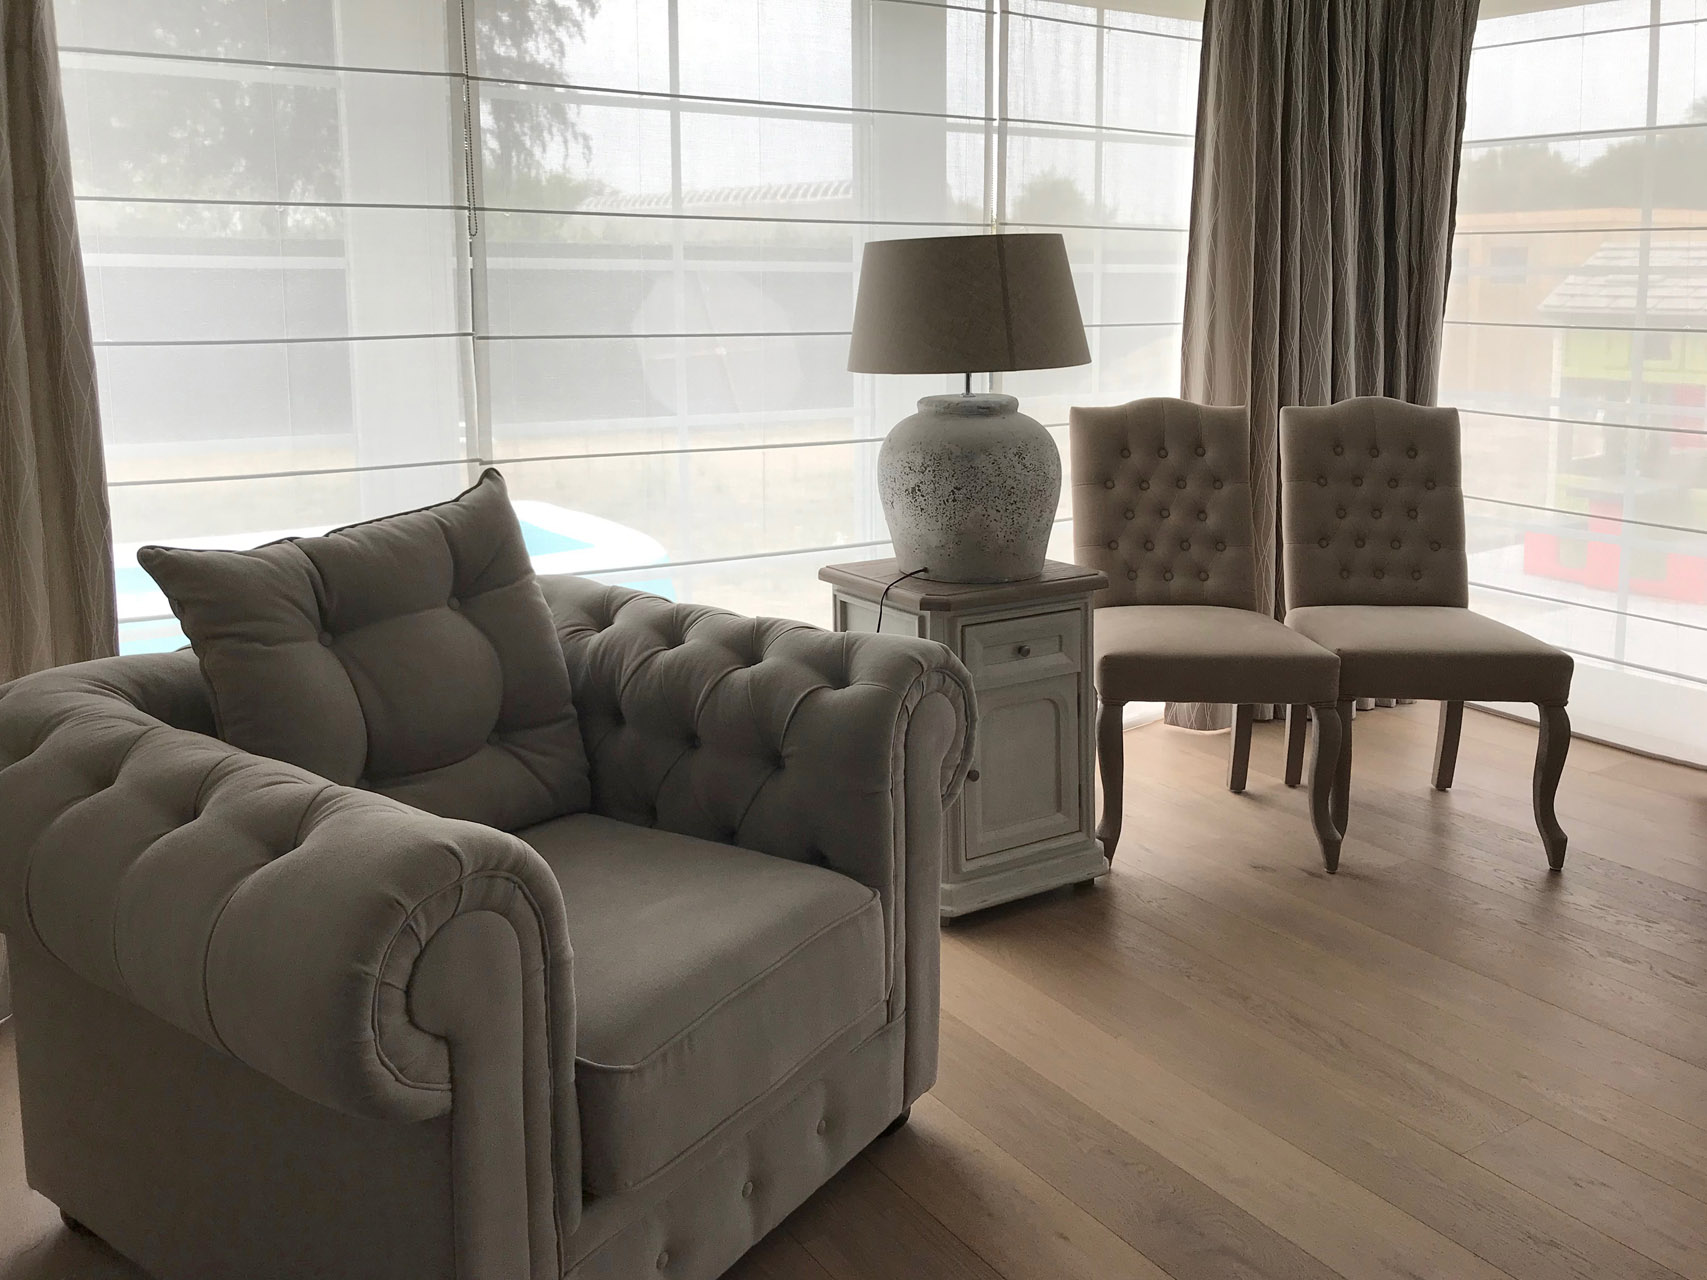 Cocoon landhausstil marcotte style